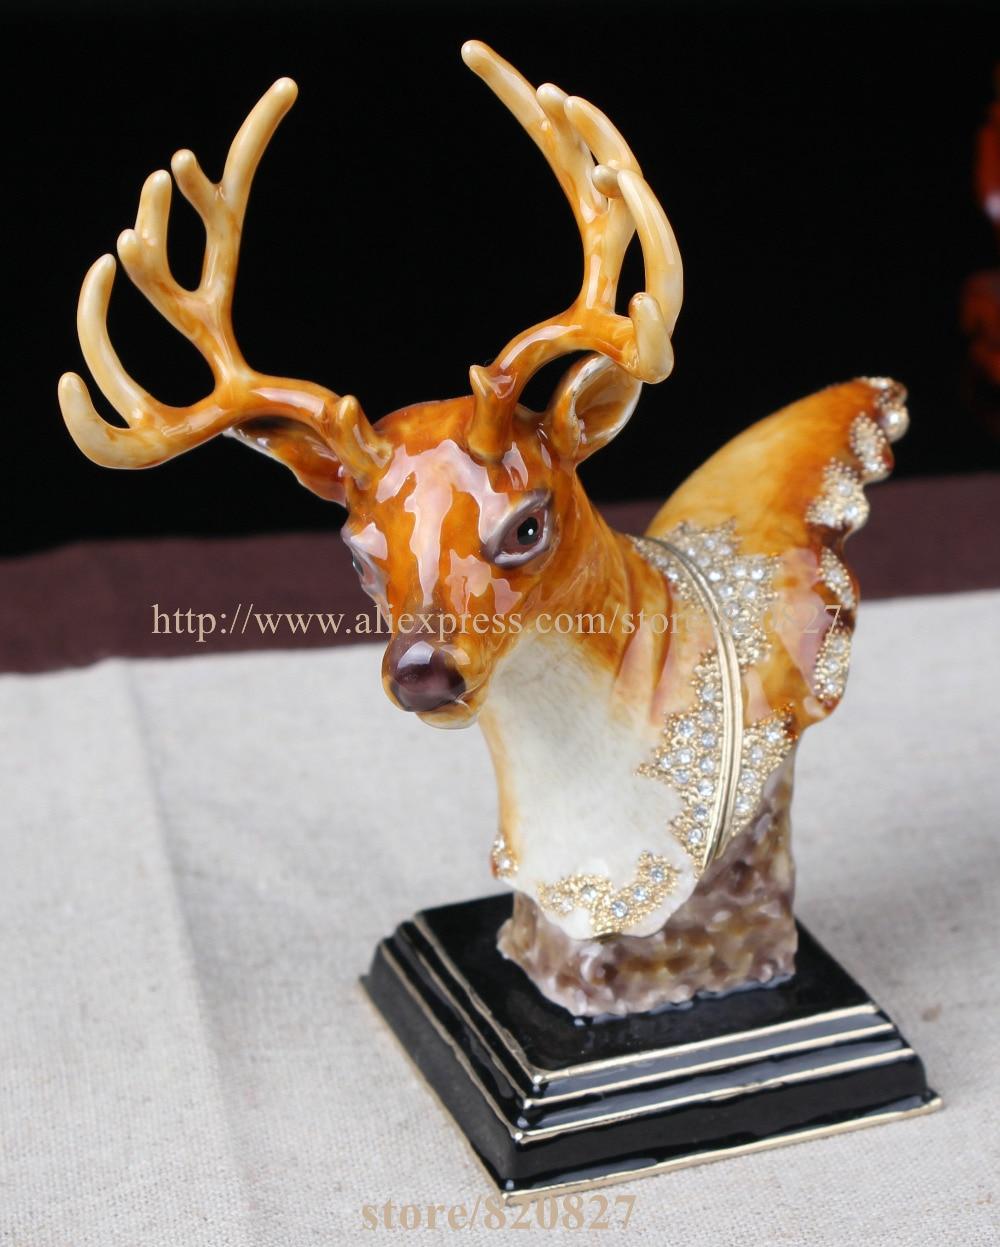 Metal Deer Figurine Display Standing Vintage Buck Deer Decor Deer Head Storage Box Pill Box Container Girl Deer